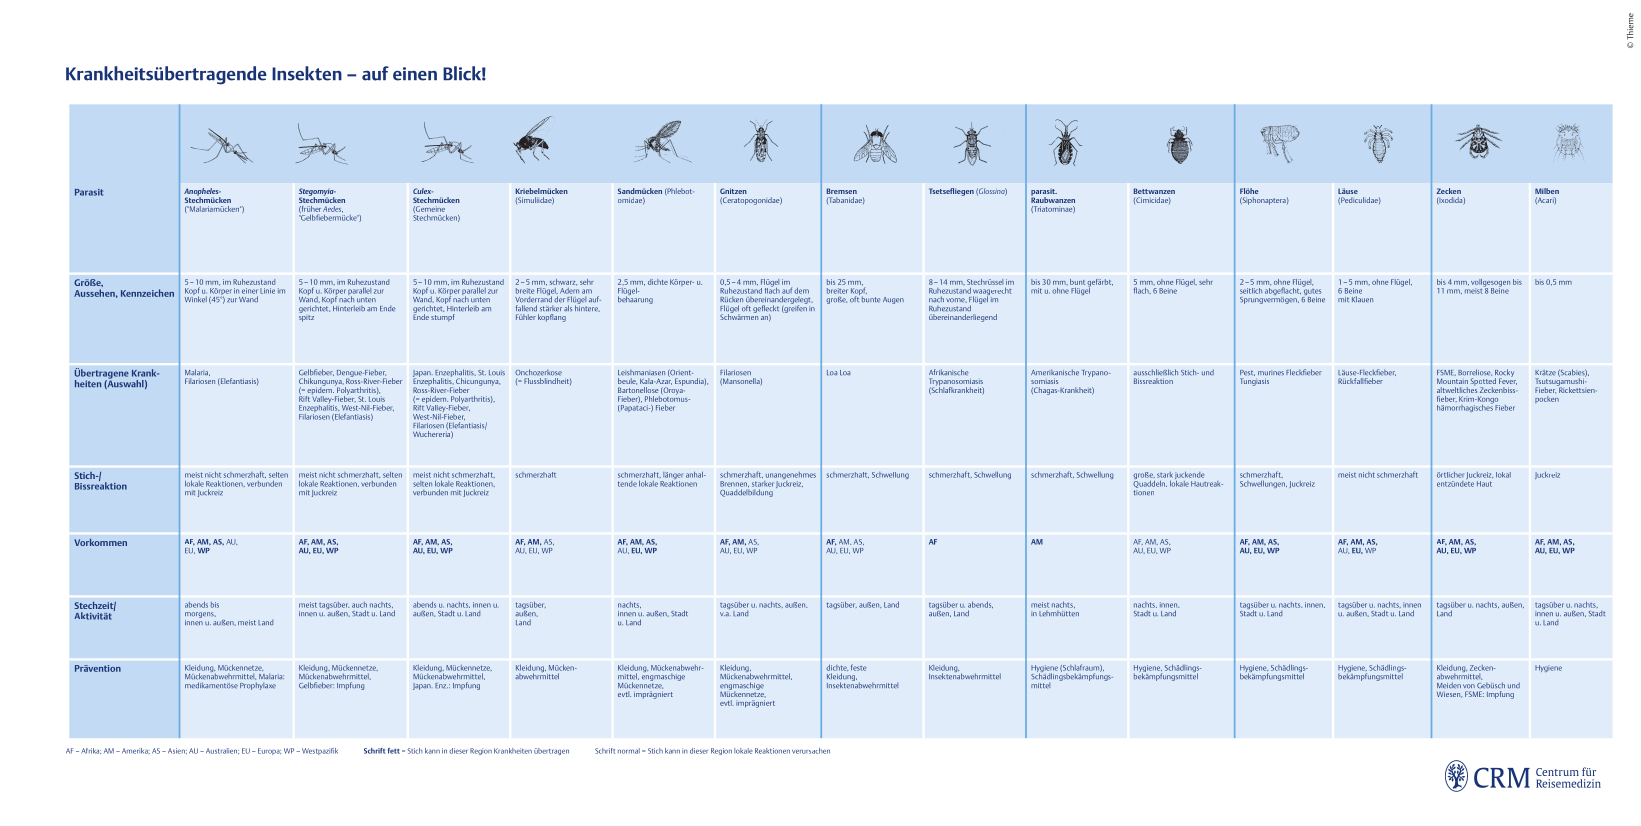 Folder_Ratgeber_Krankh_Insekten_5